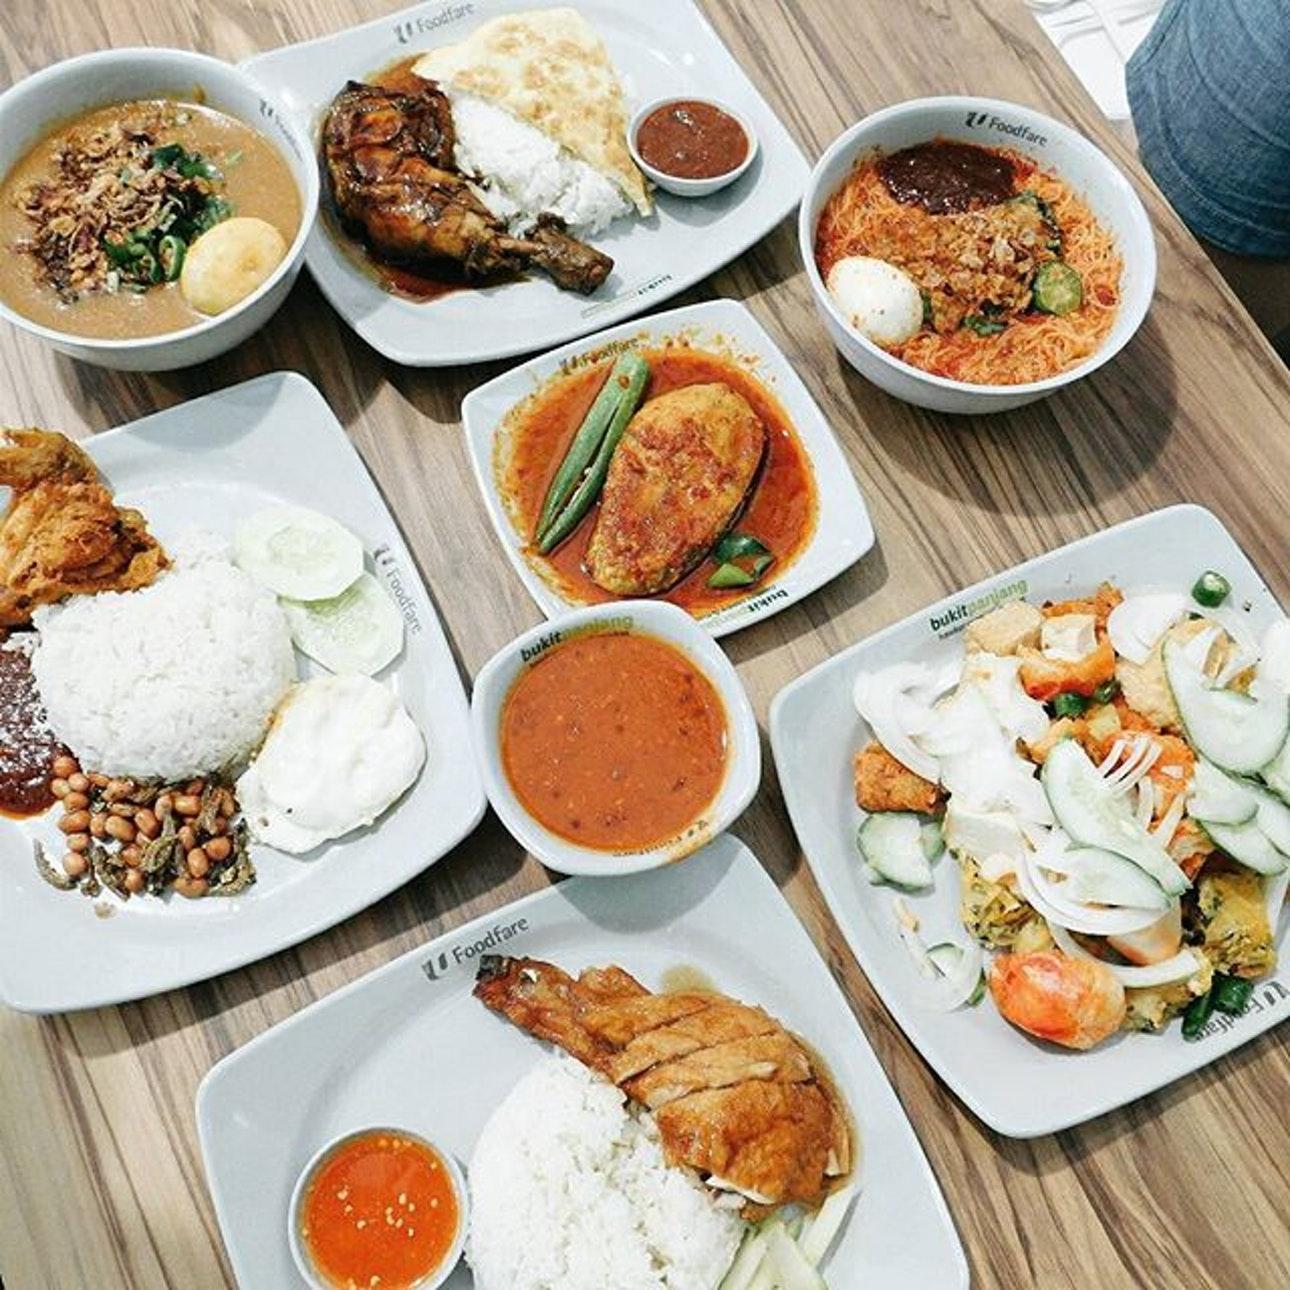 Weekend breakfast in Bukit Panjang for $2.50 … or less